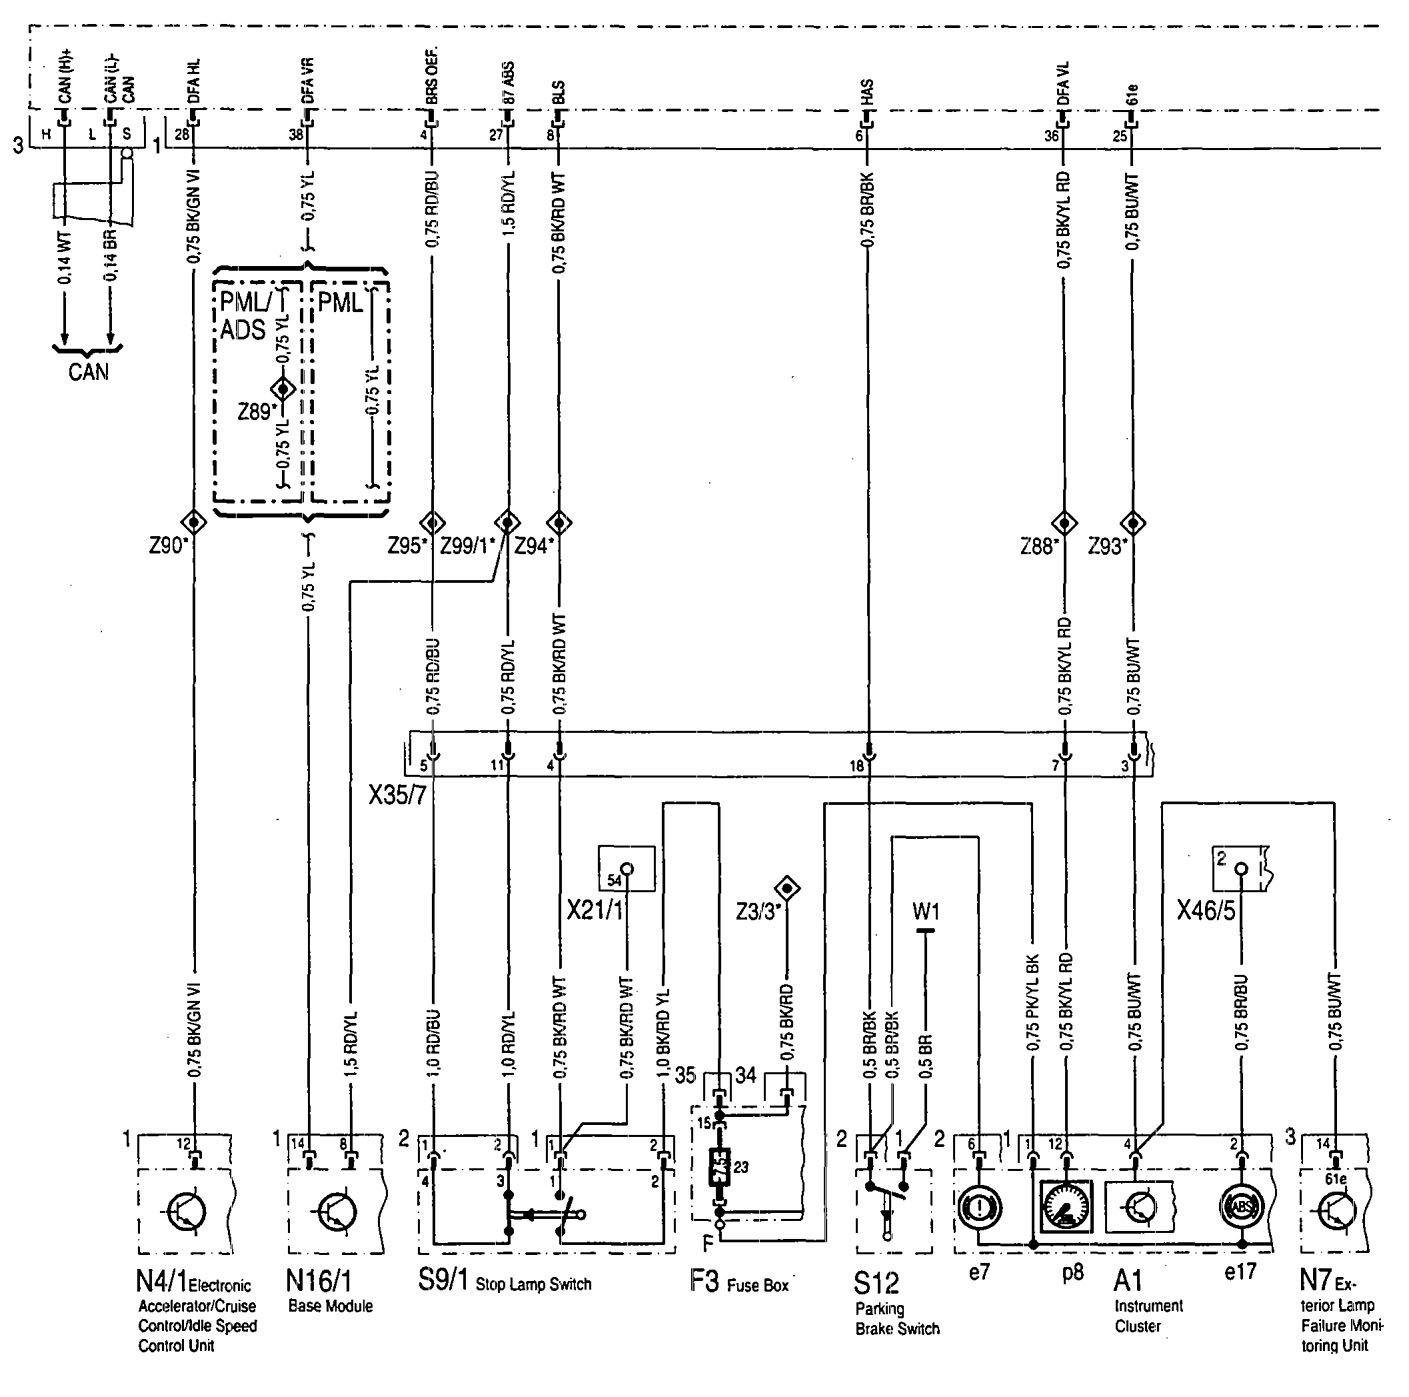 1992 mercedes 300se fuse diagram vehicle wiring diagrams rh eklablog co 1991 Mercedes 300SE Review 1991 Mercedes 300SE Review